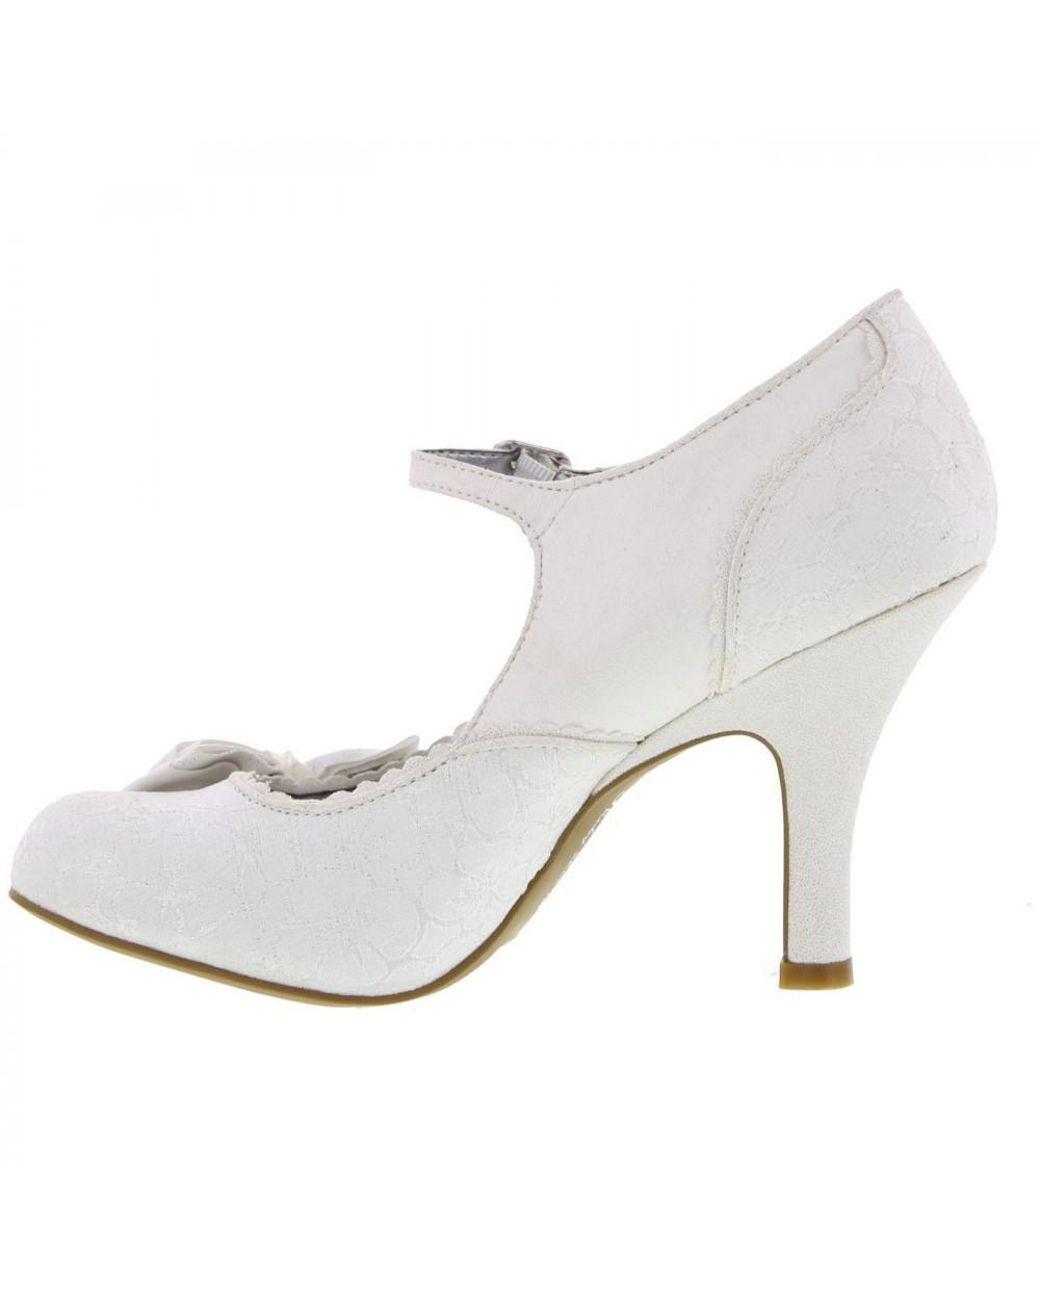 98482b42a5fac Ruby Shoo Maria Vegan Bridal Wedding Court Shoes - Lyst